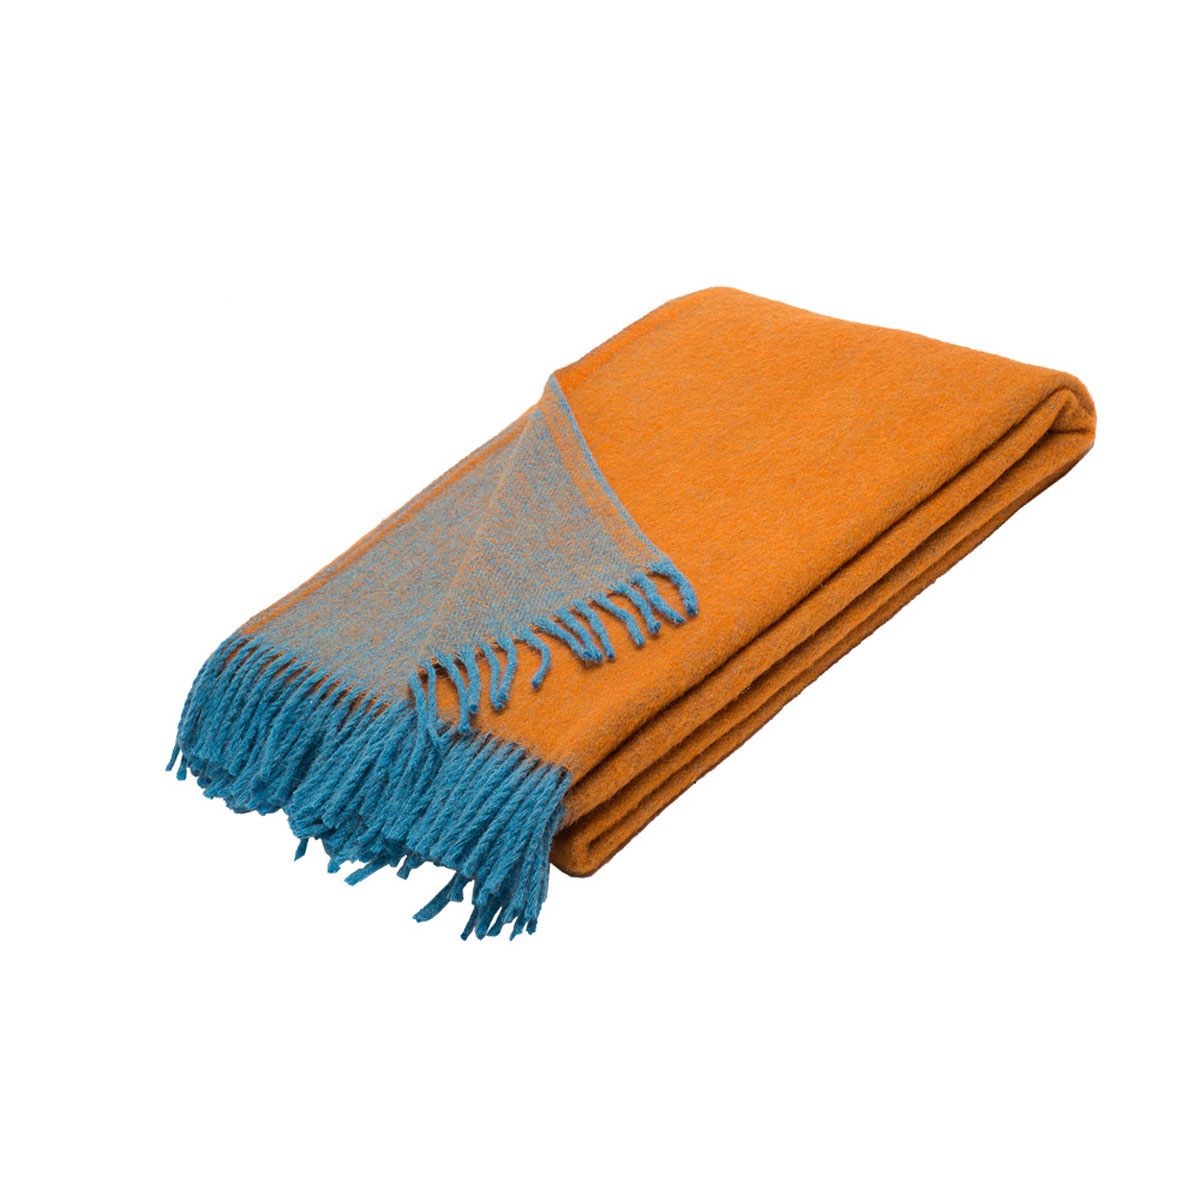 Плед Руно Дуэт, цвет: оранжевый, синий, 140 х 200 см. 1-531-140 (68) коврик домашний sunstep цвет синий 140 х 200 х 4 см